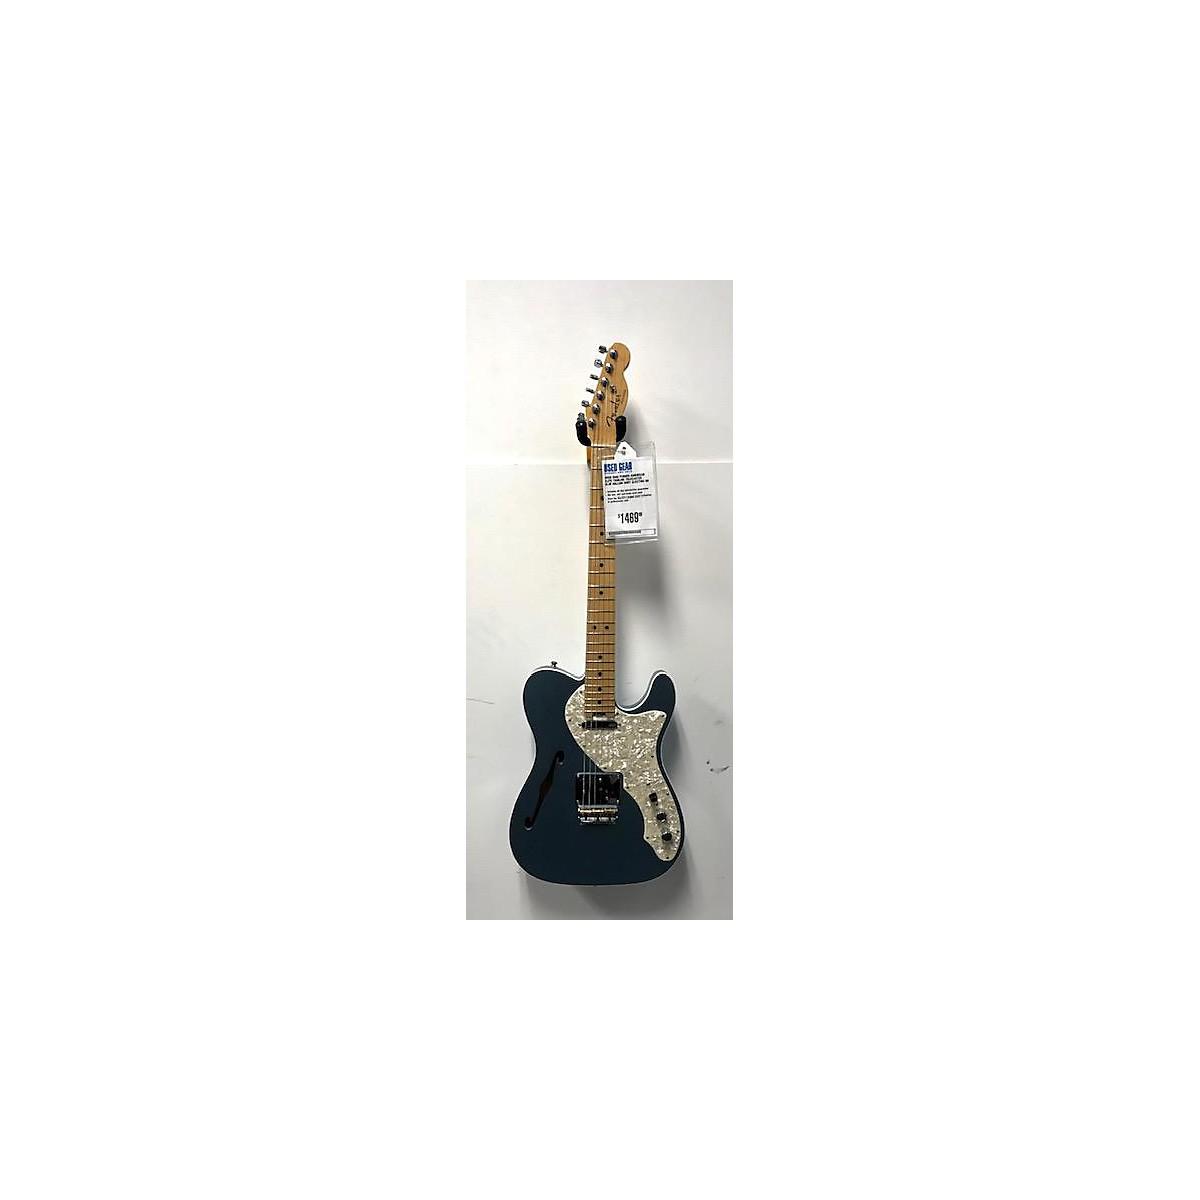 Fender 2002 American Elite Thinline Telecaster Hollow Body Electric Guitar